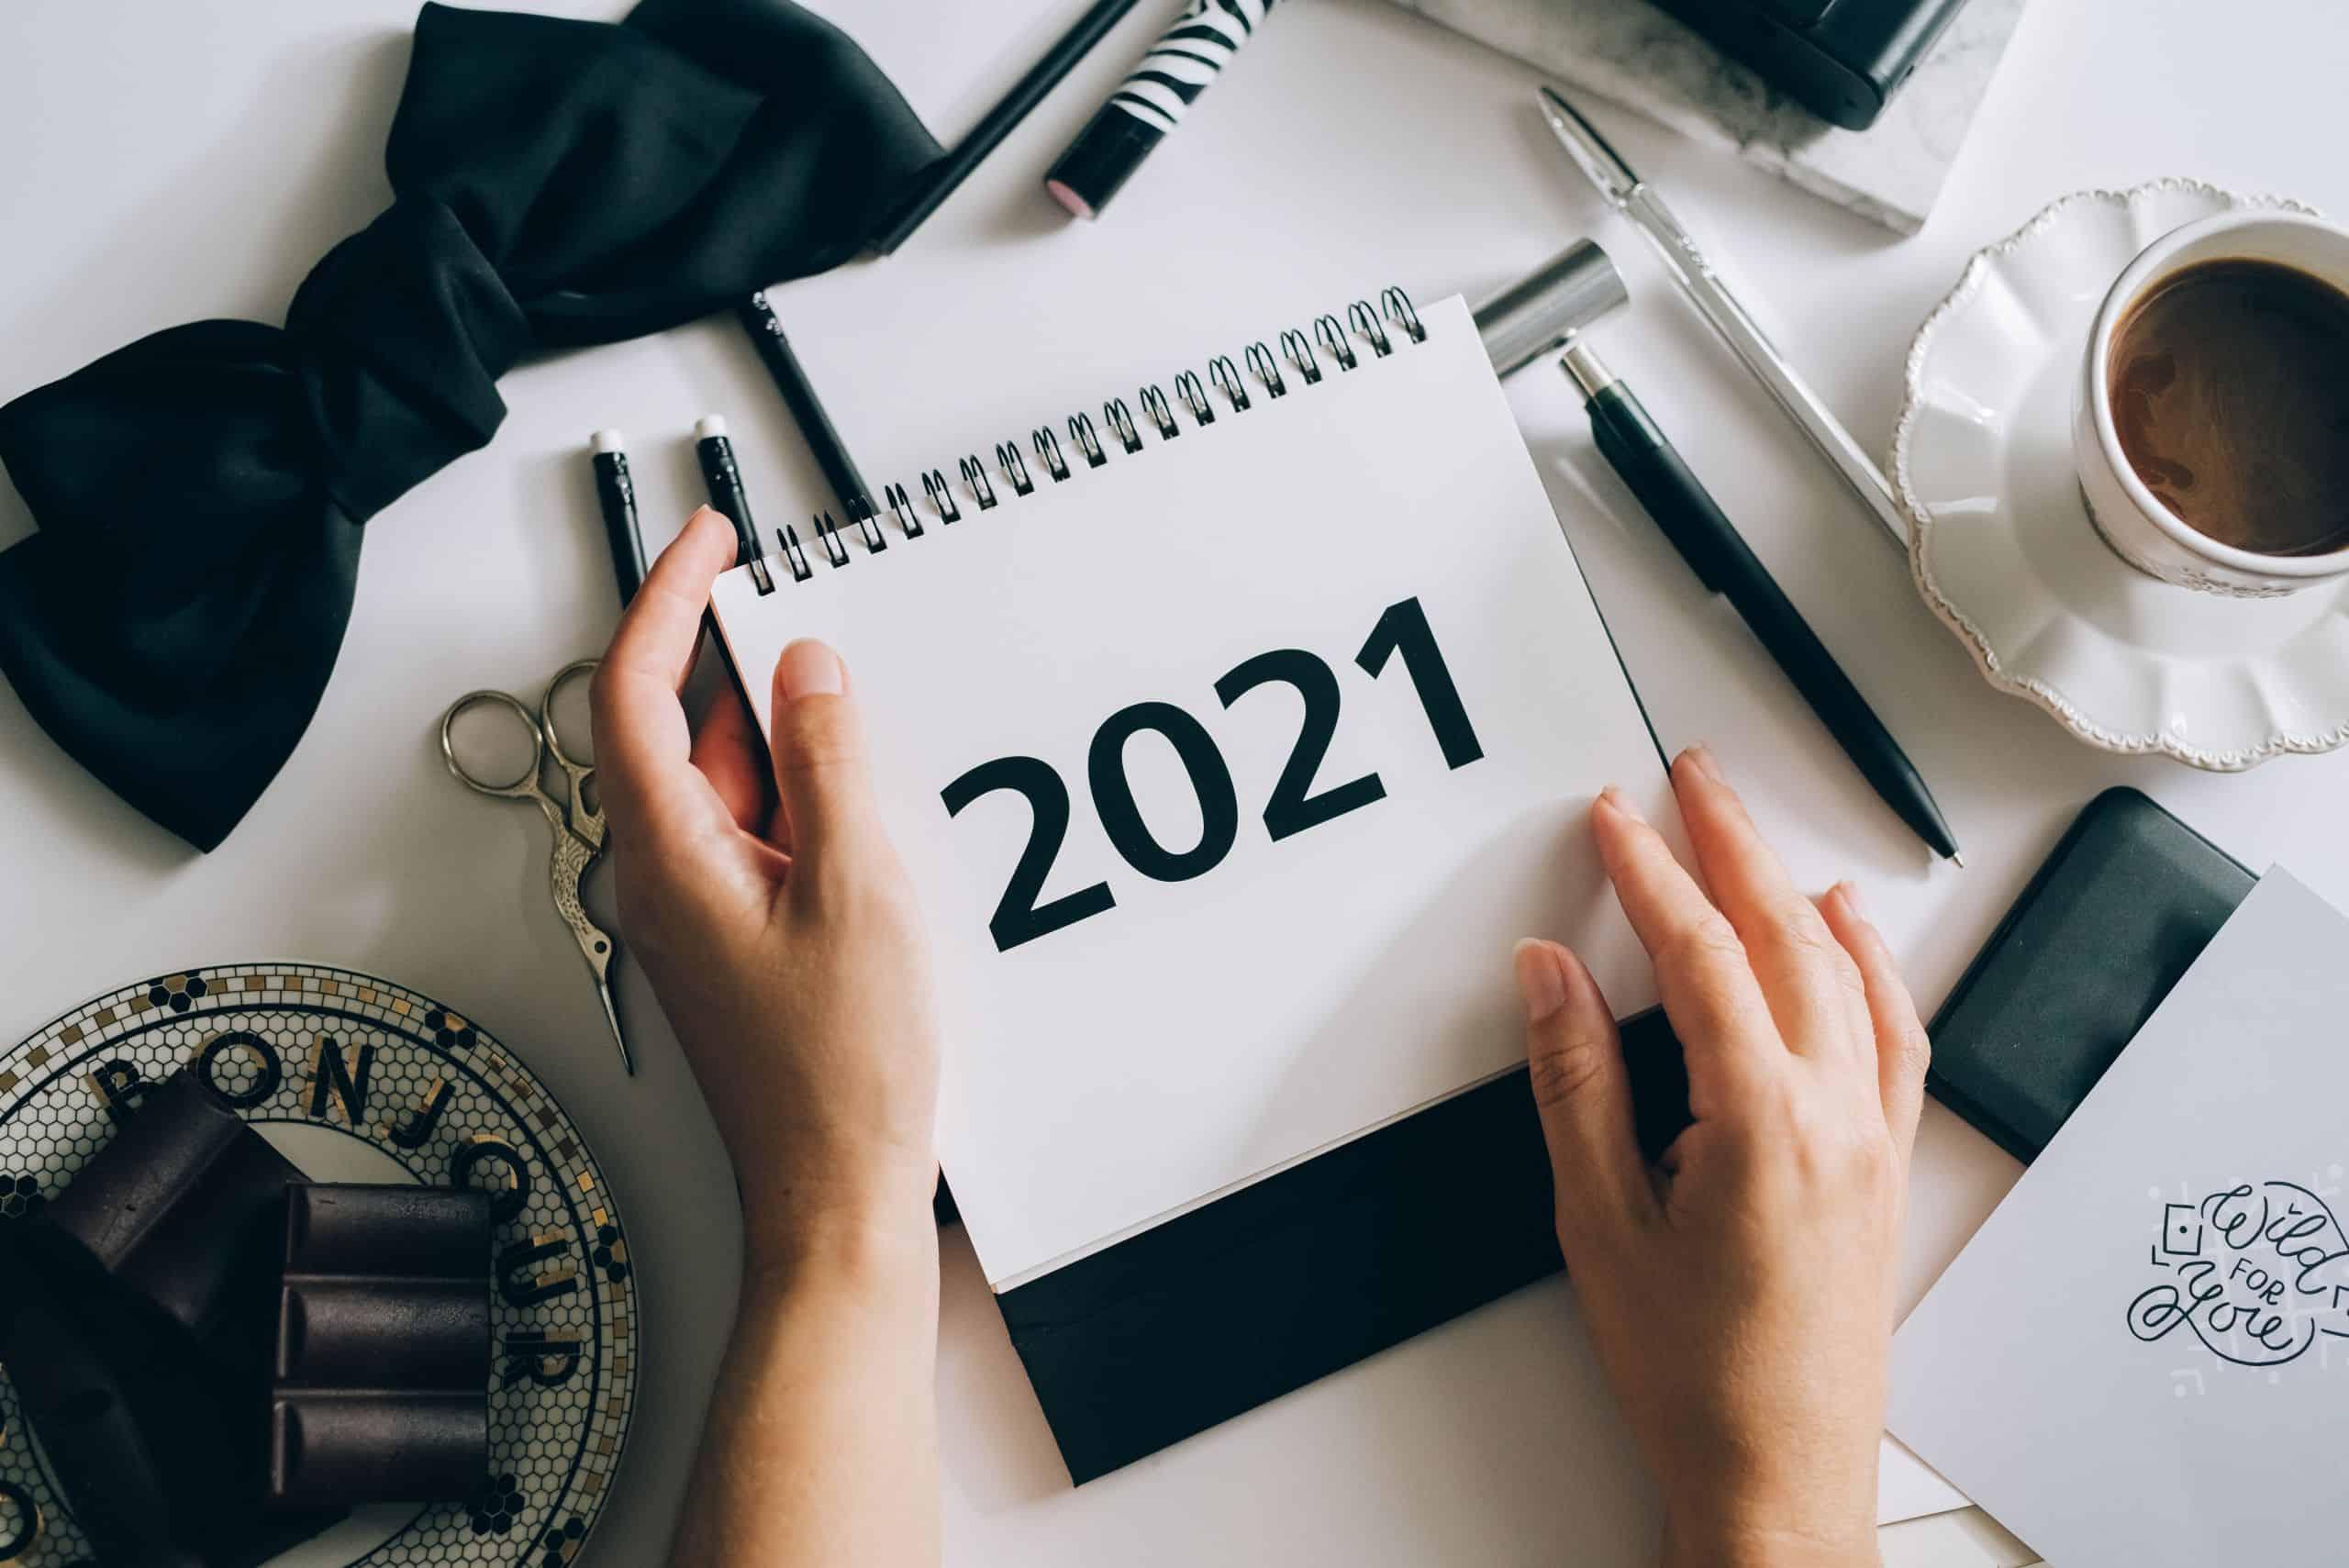 Kilometrikorvaus Verotuksessa 2021